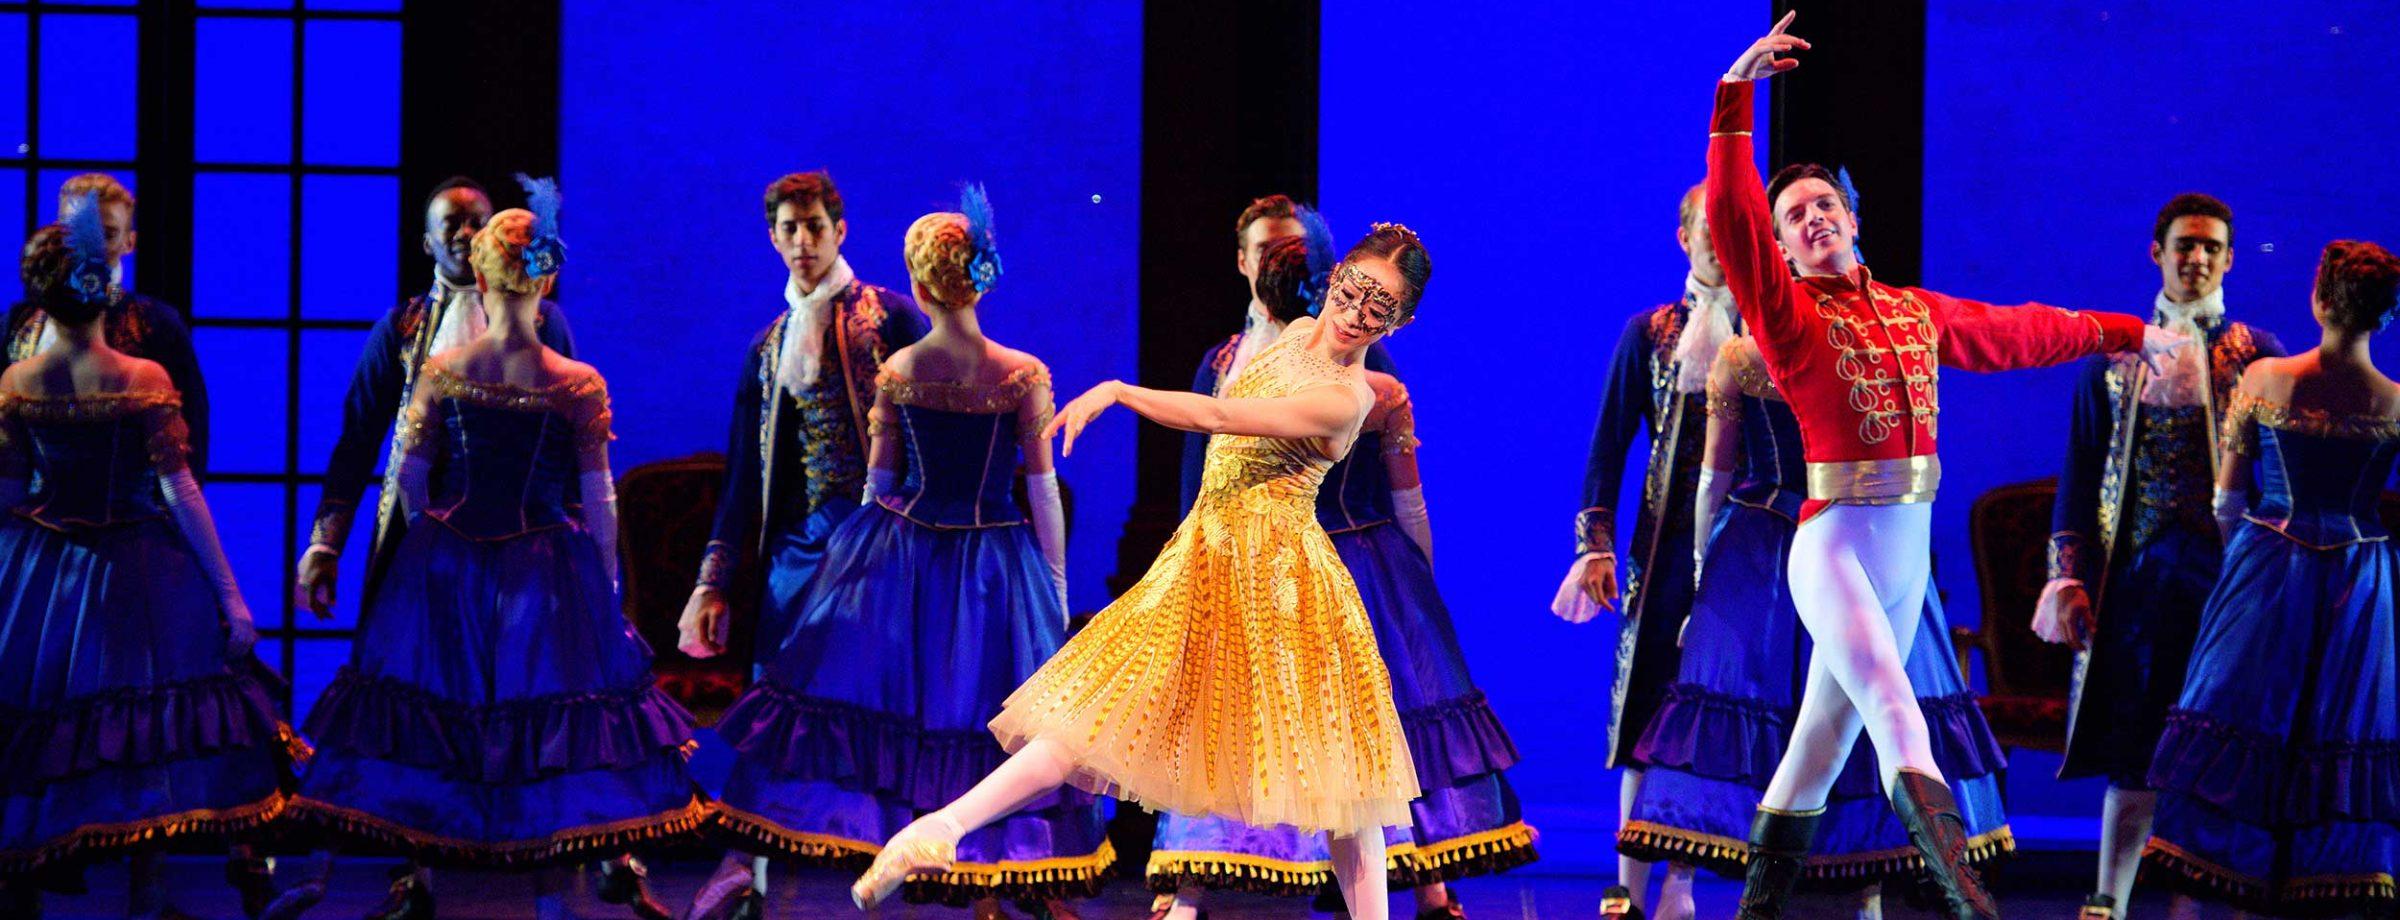 WEB-Erina-Takahashi-and-Joseph-Caley-in-English-National-Ballet's-Cinderella-(c)-Laurent-Liotardo-(4)